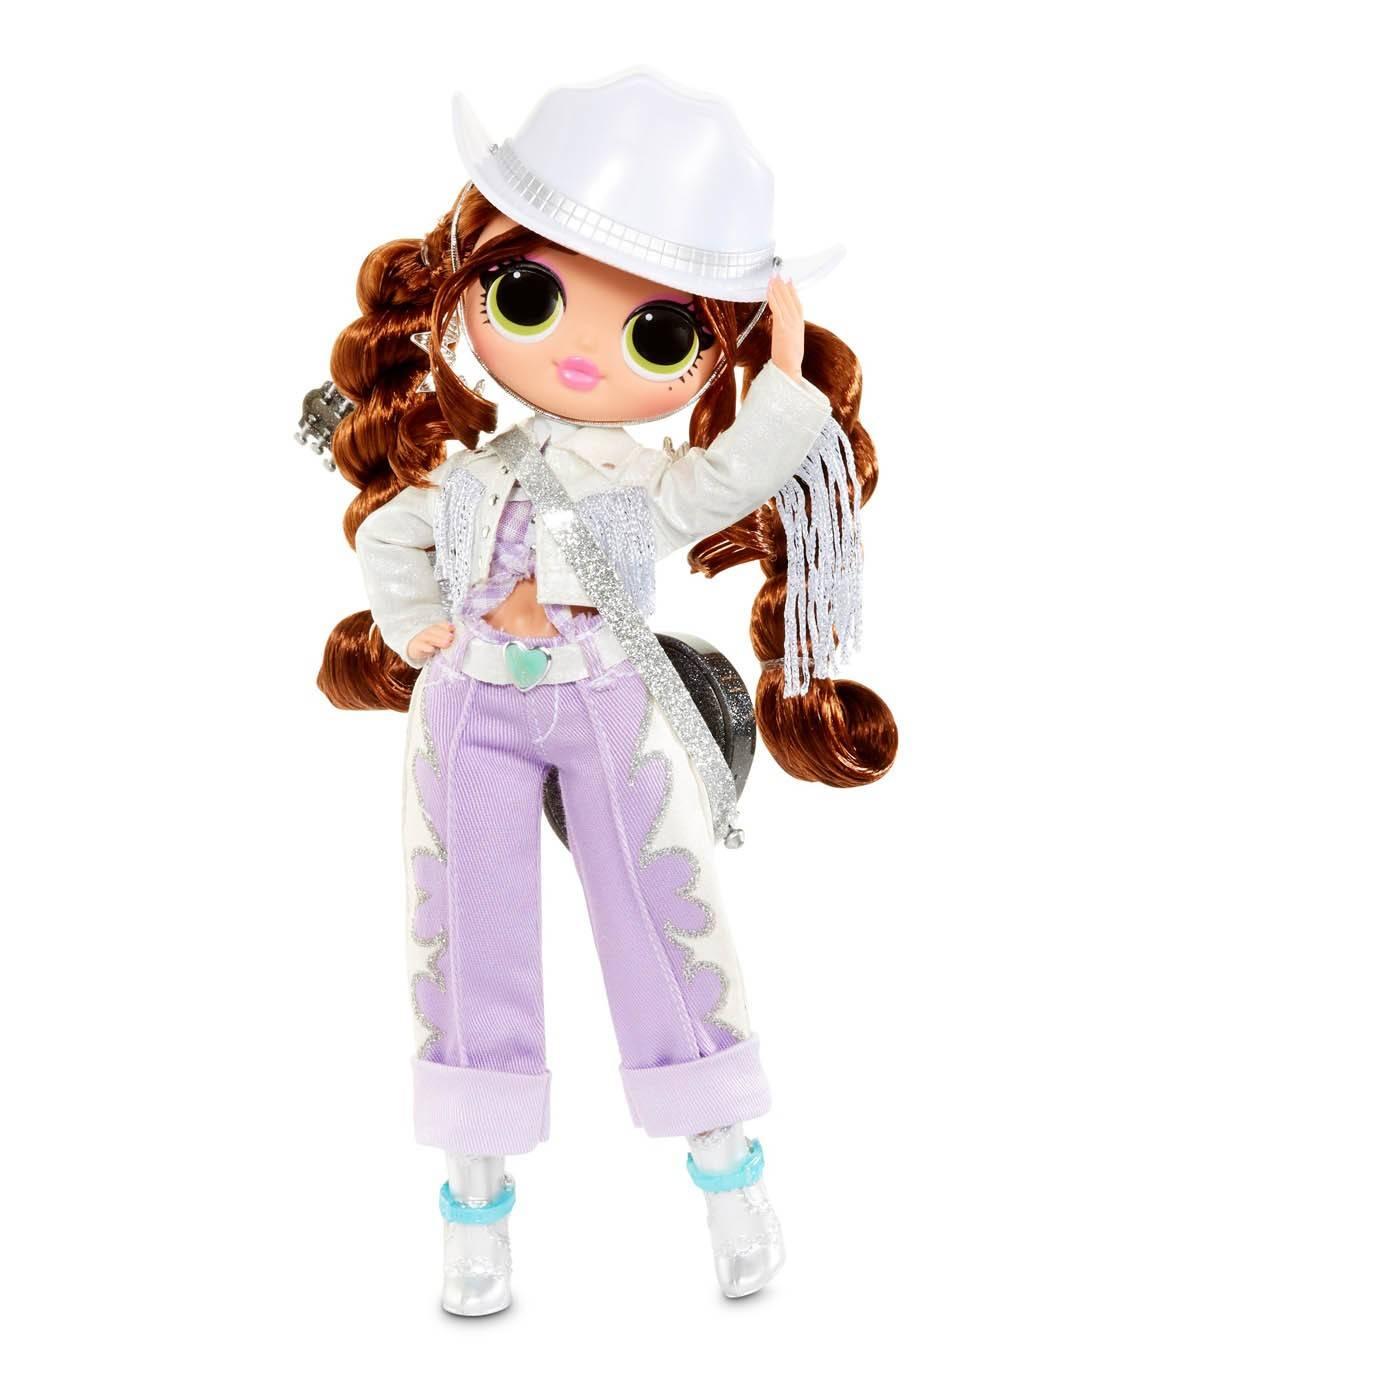 LOL Surprise OMG Remix Lonestar Country Girl lalka modowa 567233